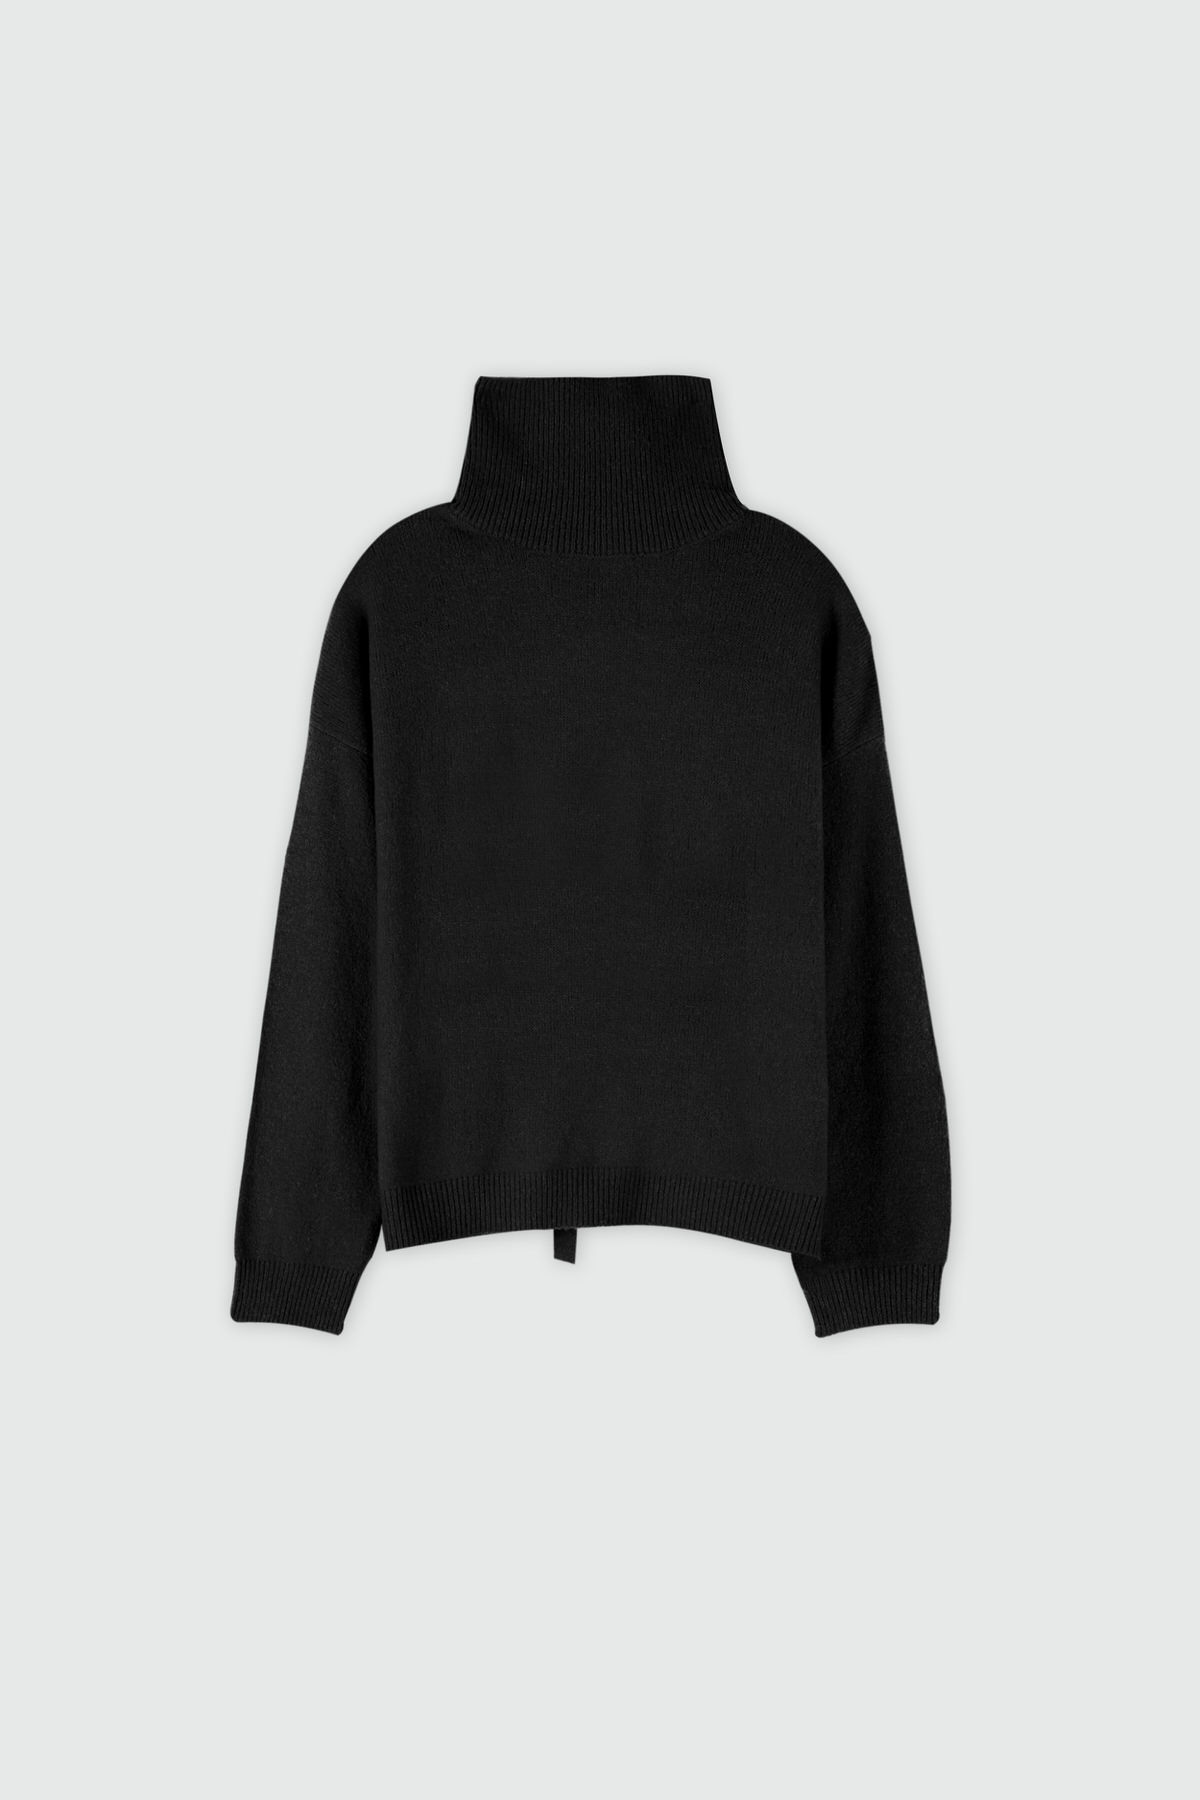 Sweater 2619 Black 11